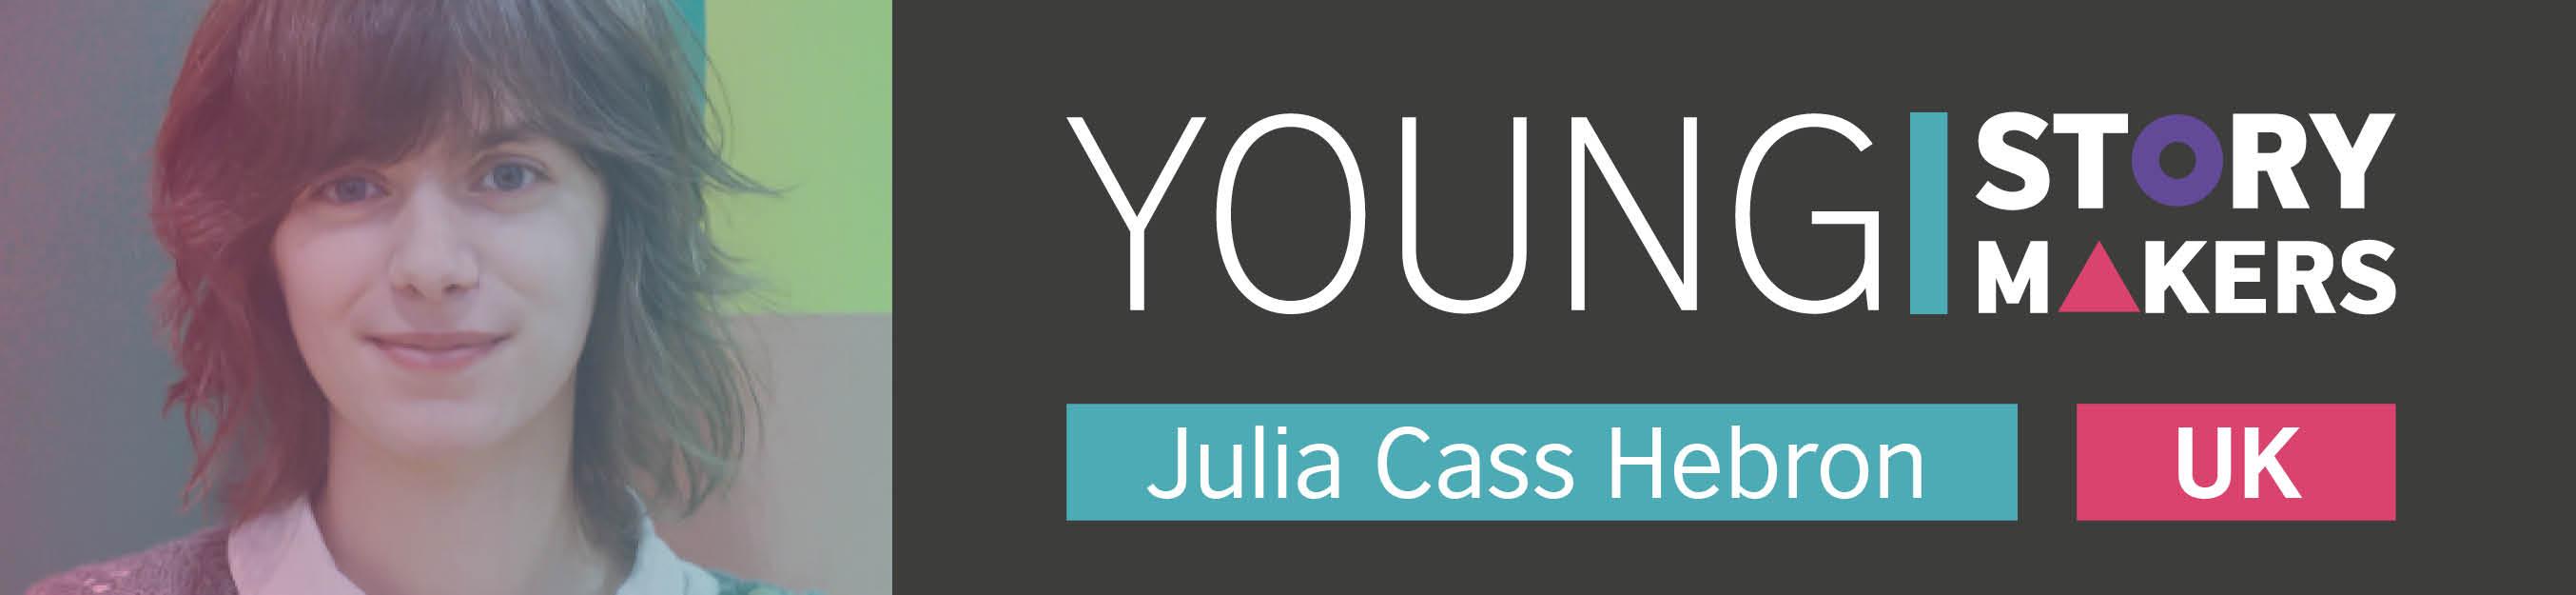 young storymaker Julia Cass Hebron